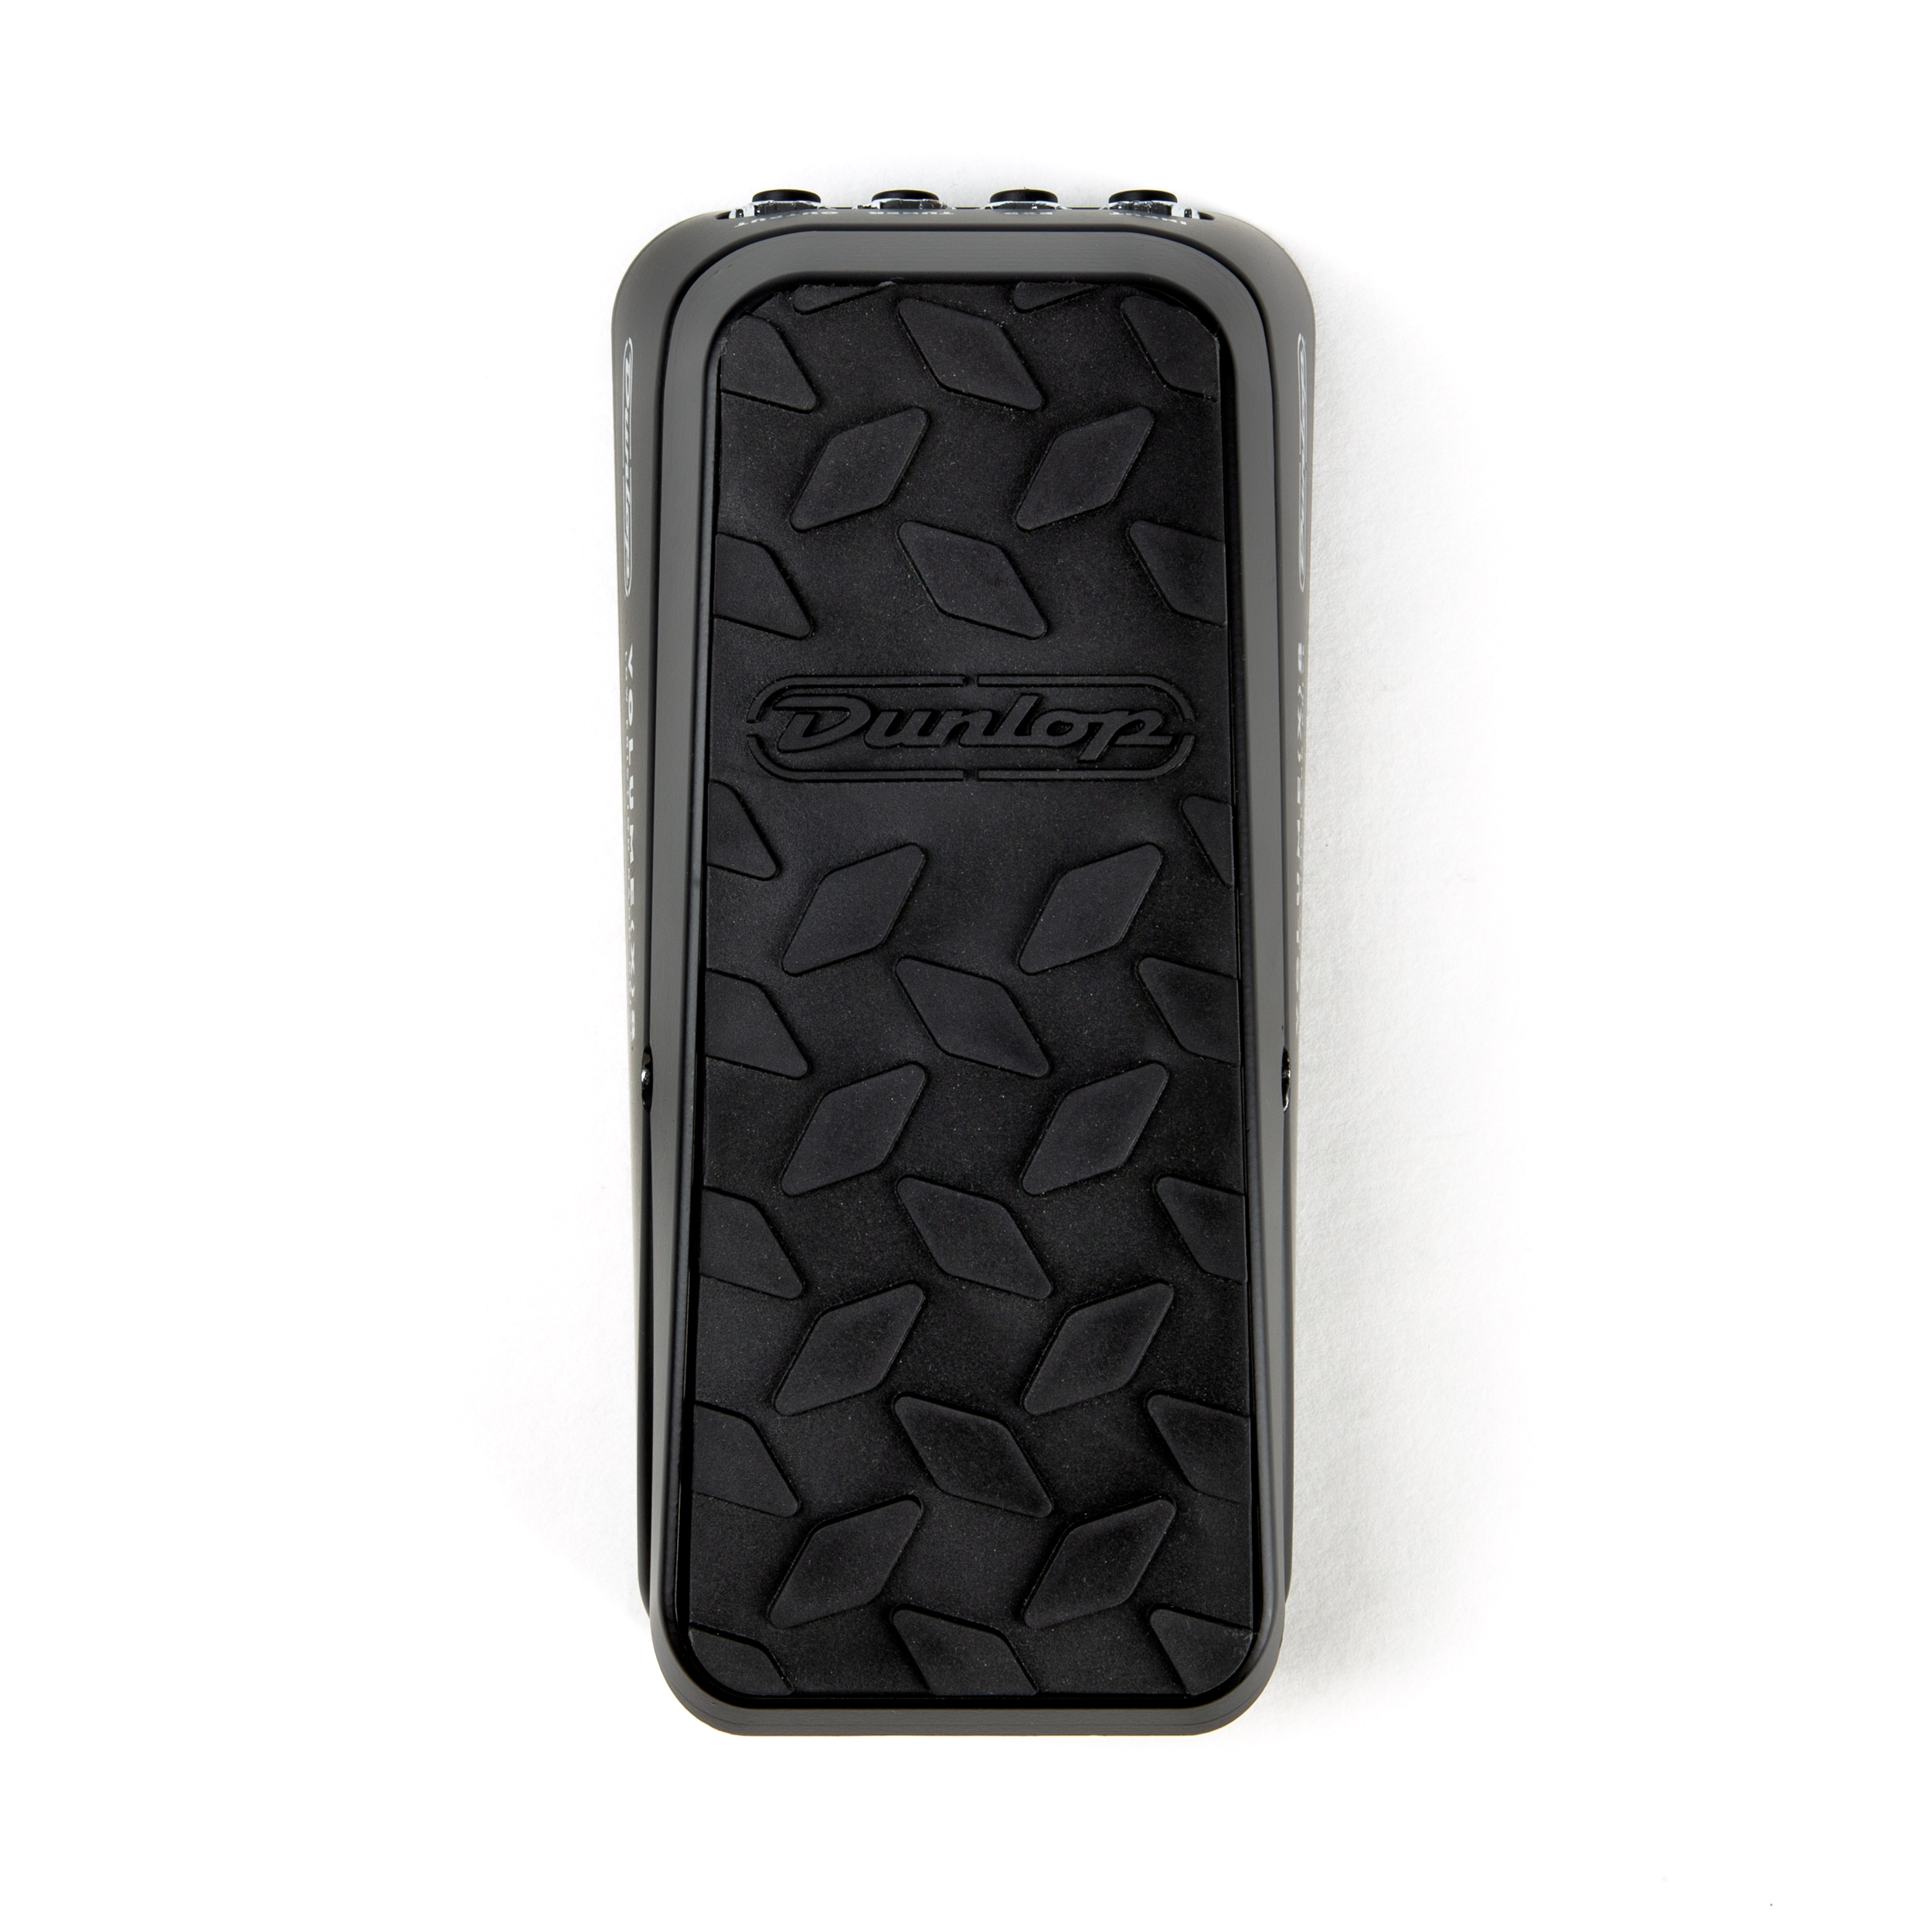 Dunlop Volume X8 Pedal